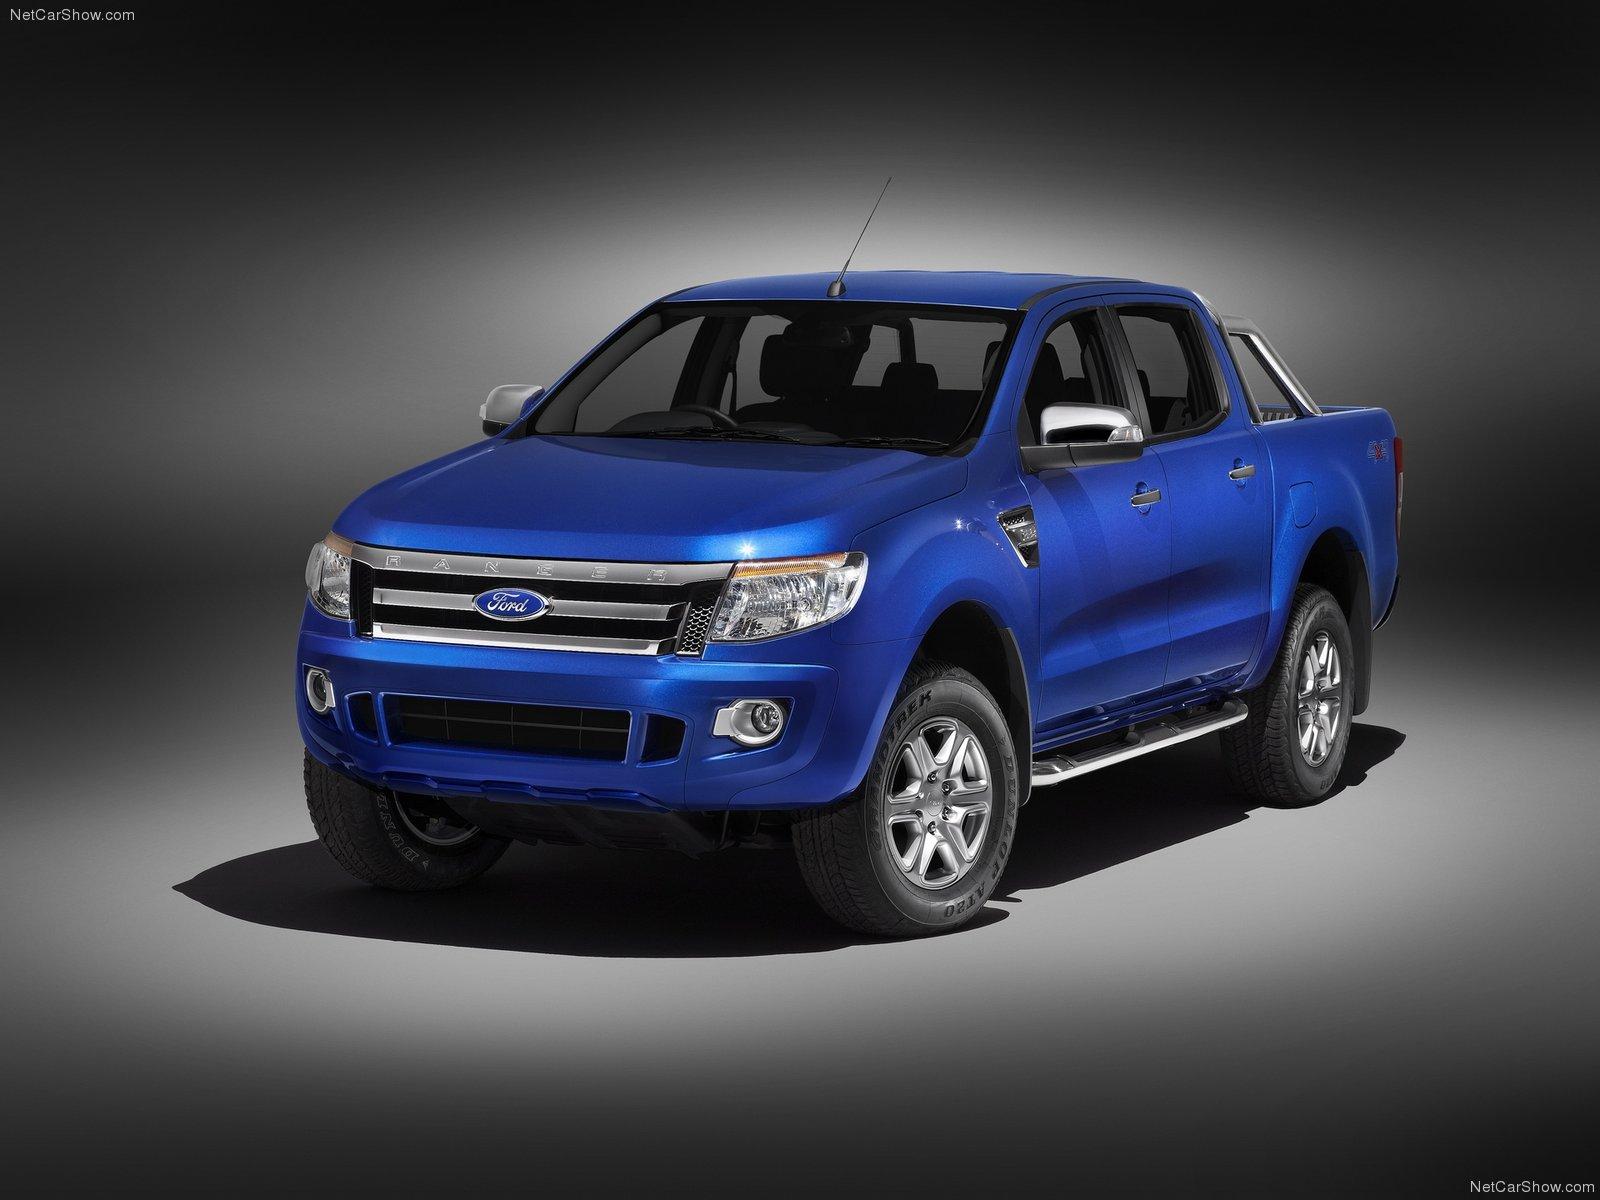 http://4.bp.blogspot.com/_wTut9ZHVJMY/TQxiKXYJD8I/AAAAAAAAAEQ/aynHY7q8pV0/s1600/Ford-Ranger_2012_1600x1200_wallpaper_05.jpg